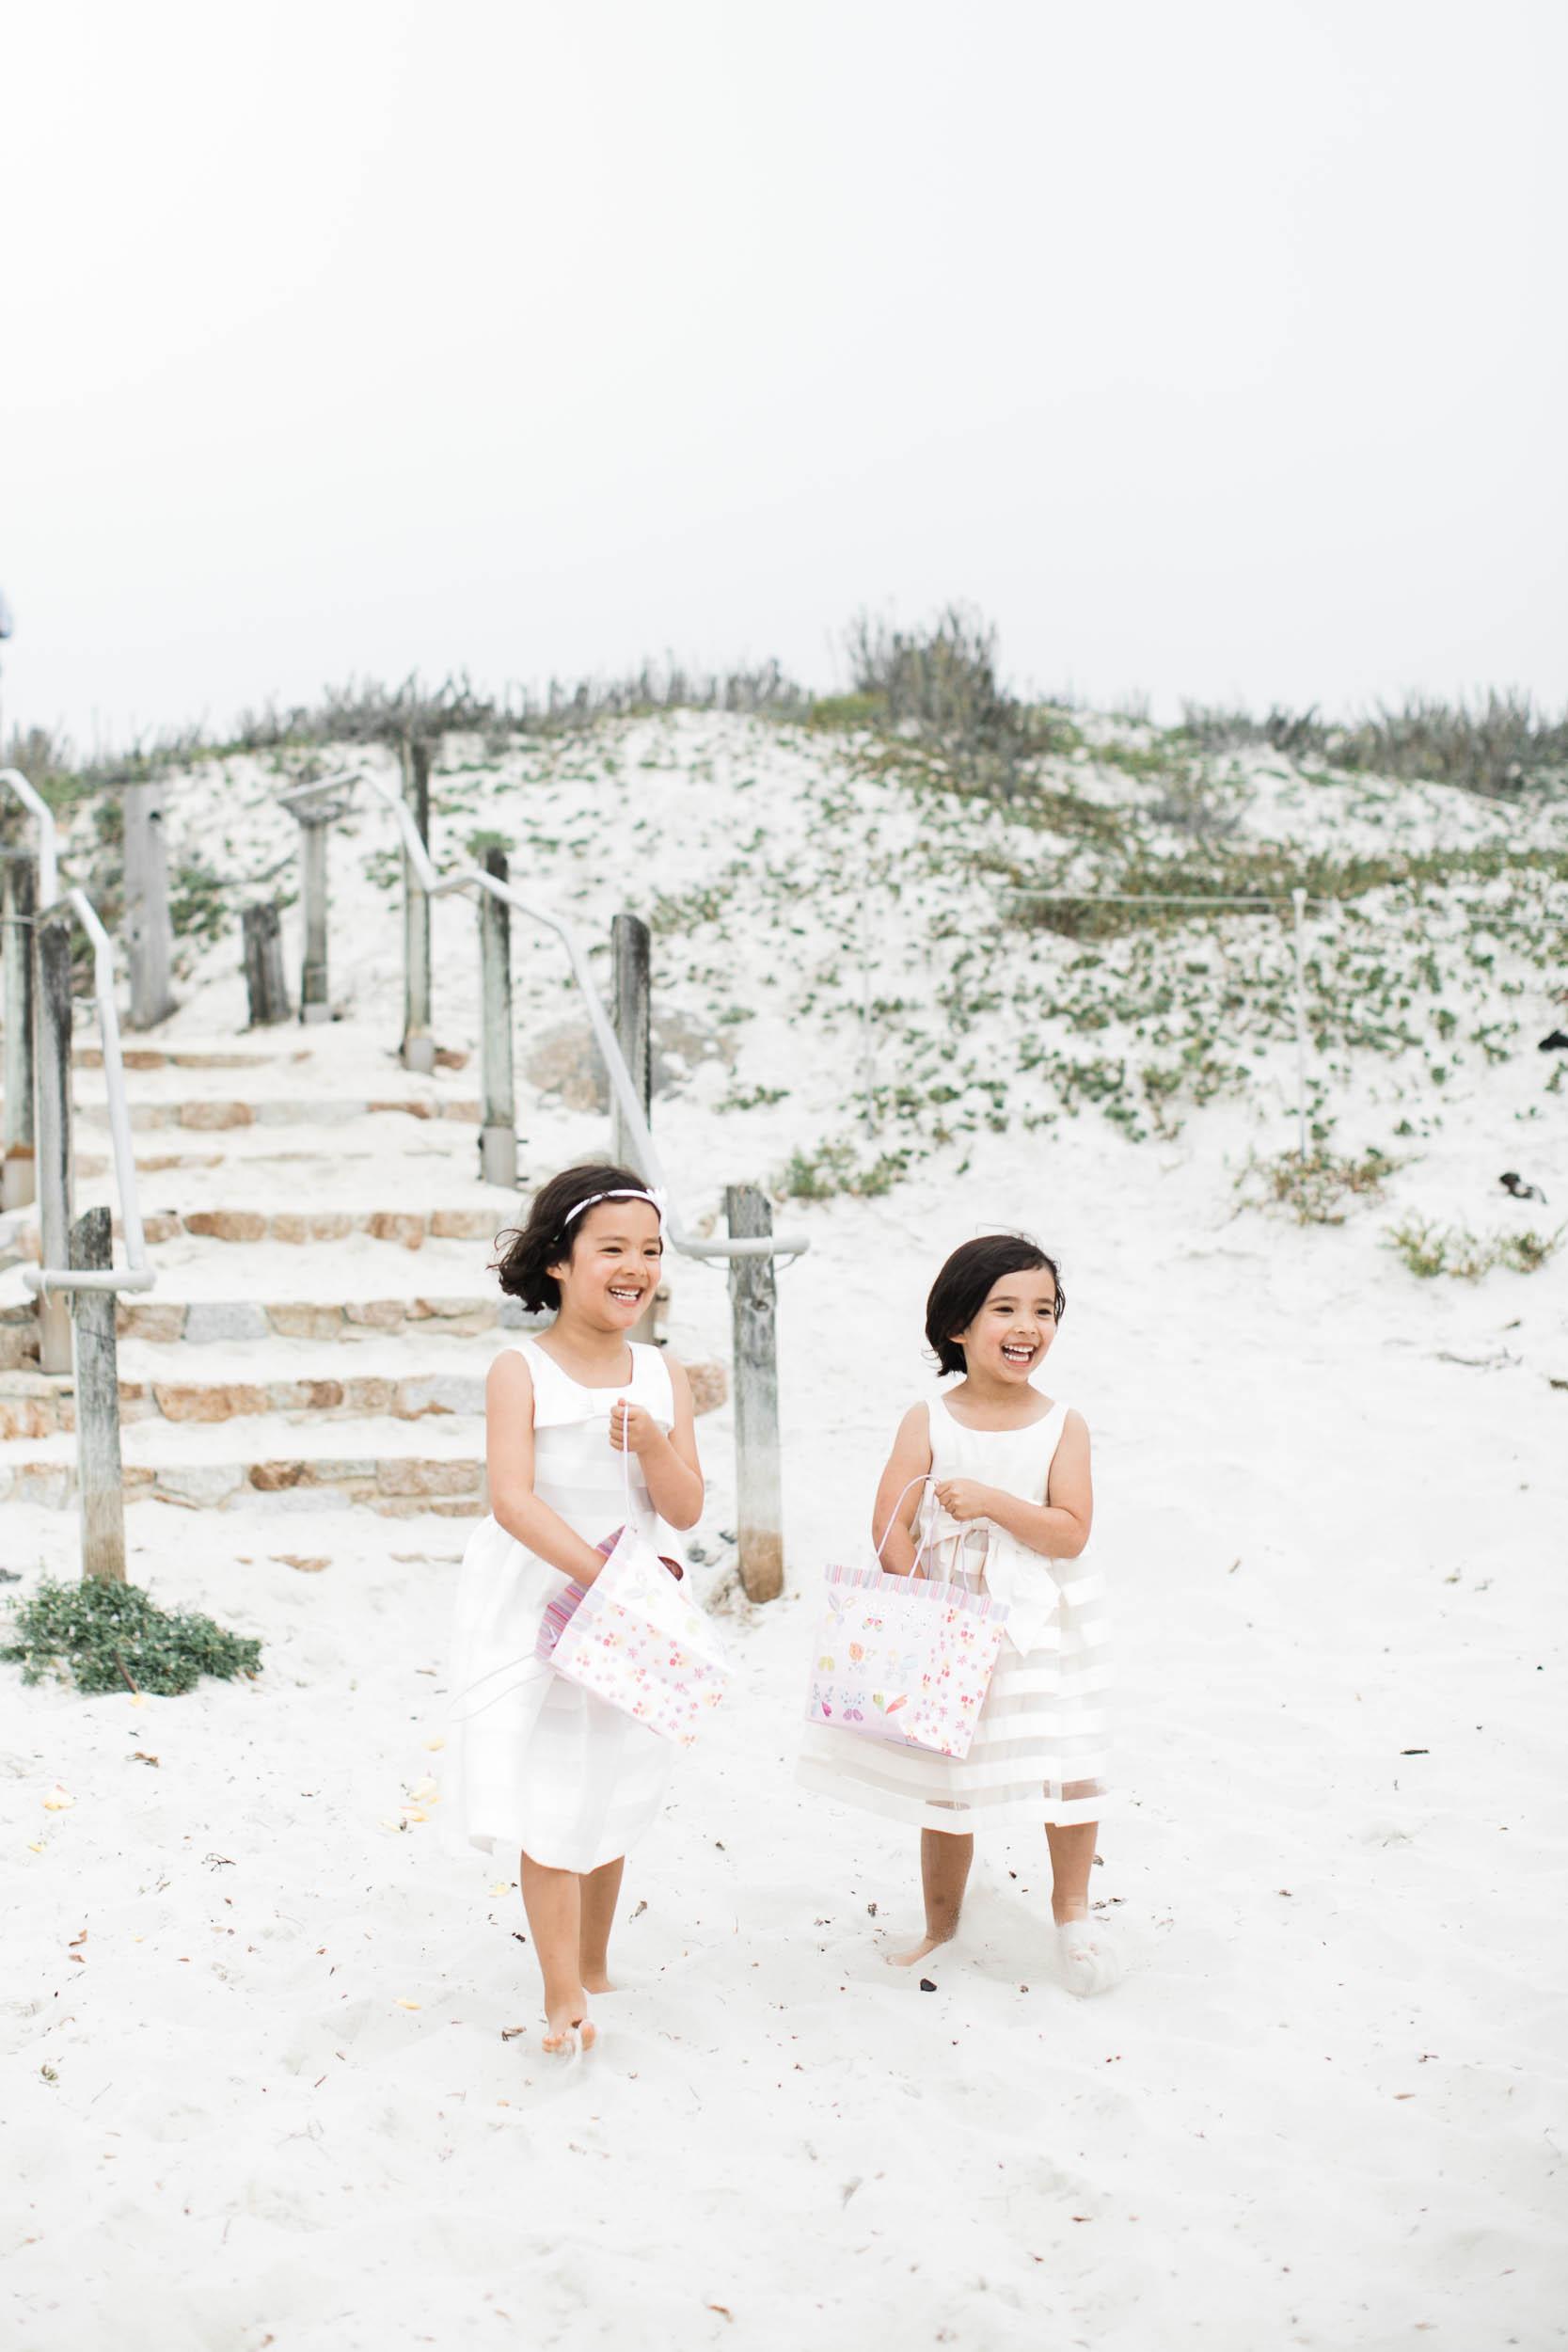 082617_C+K_Asilomar Pacific Grove Wedding_Buena Lane Photography_2378ER.jpg